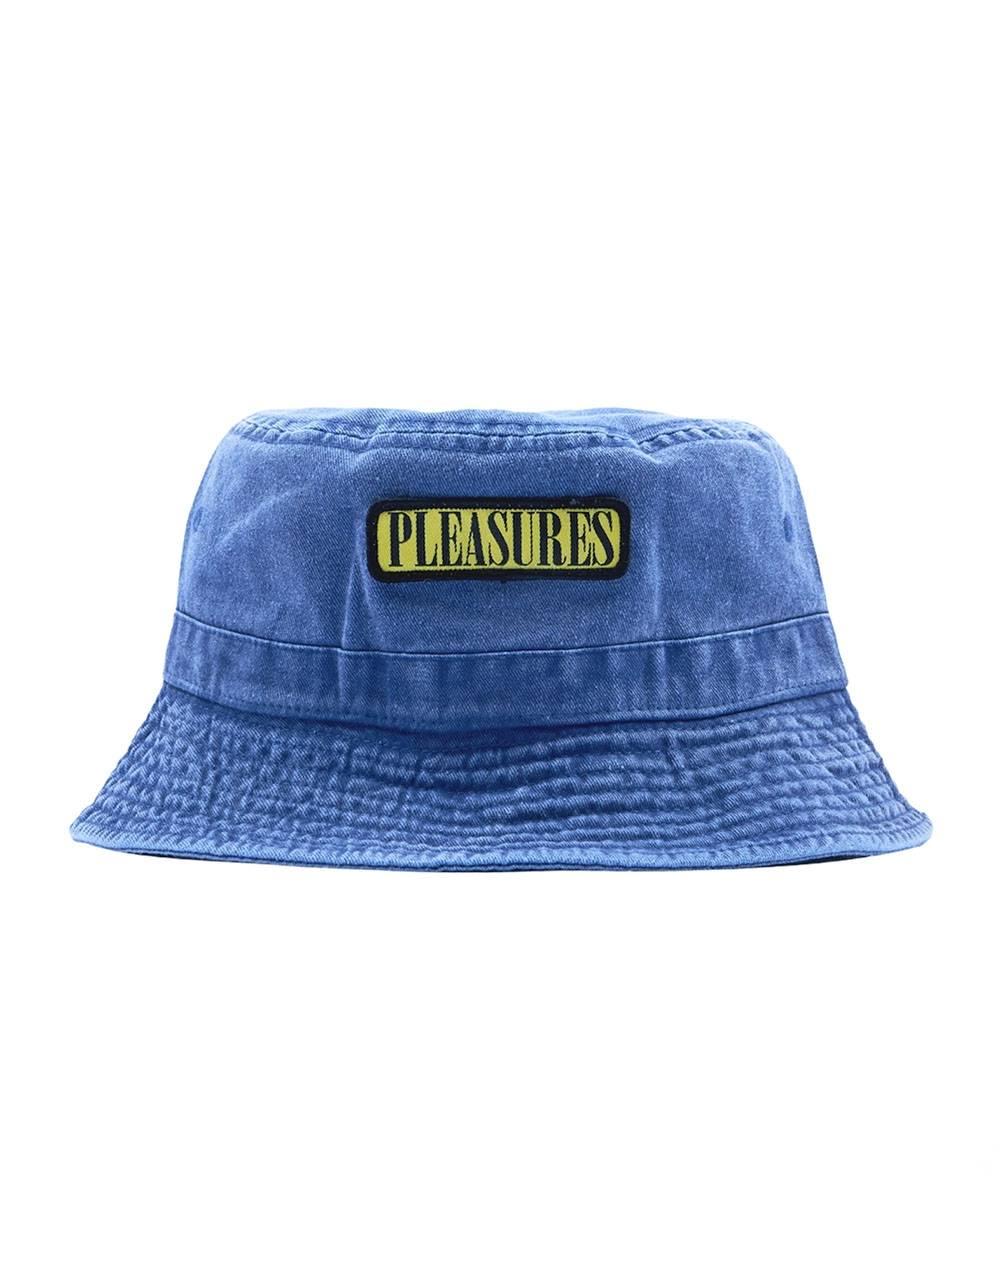 Pleasures Spank bucket hat - washed blue Pleasures Hat 45,08€